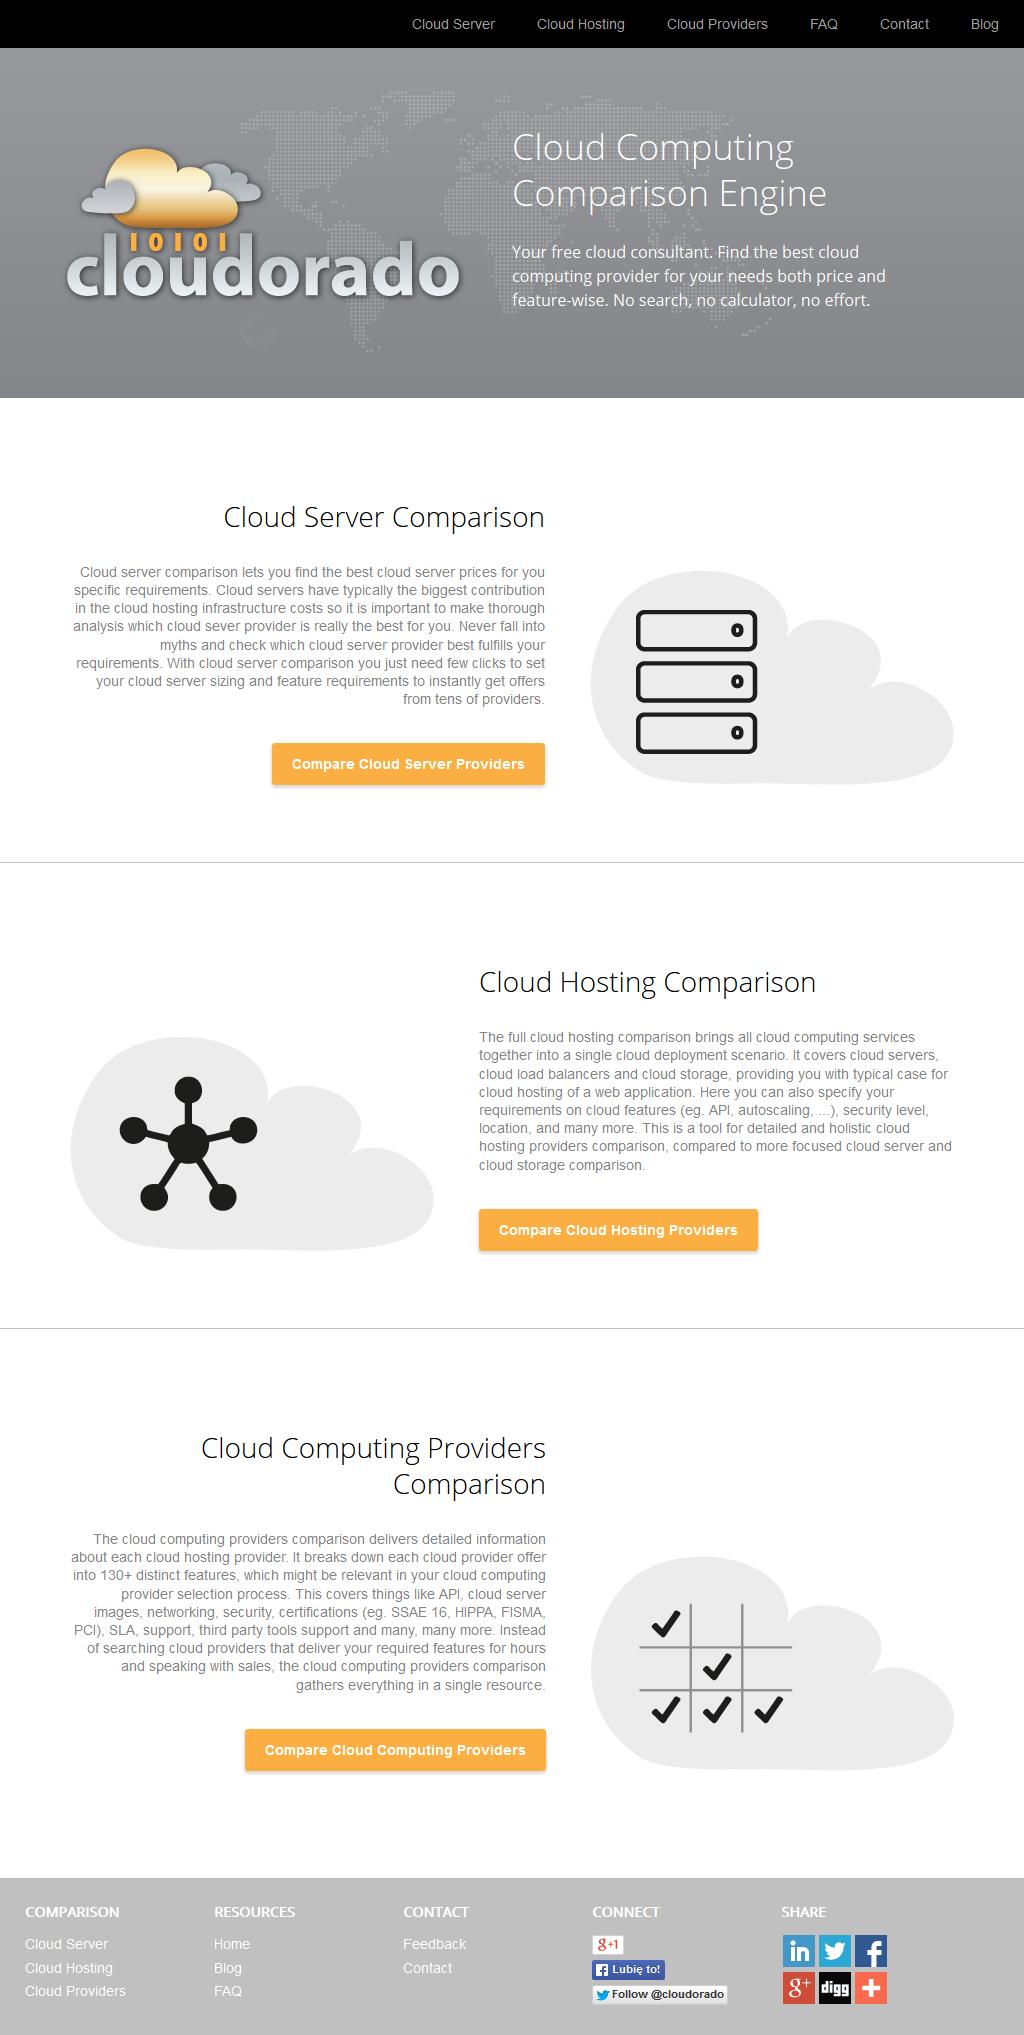 Cloudorado Launches New Cloud Computing Comparison Service